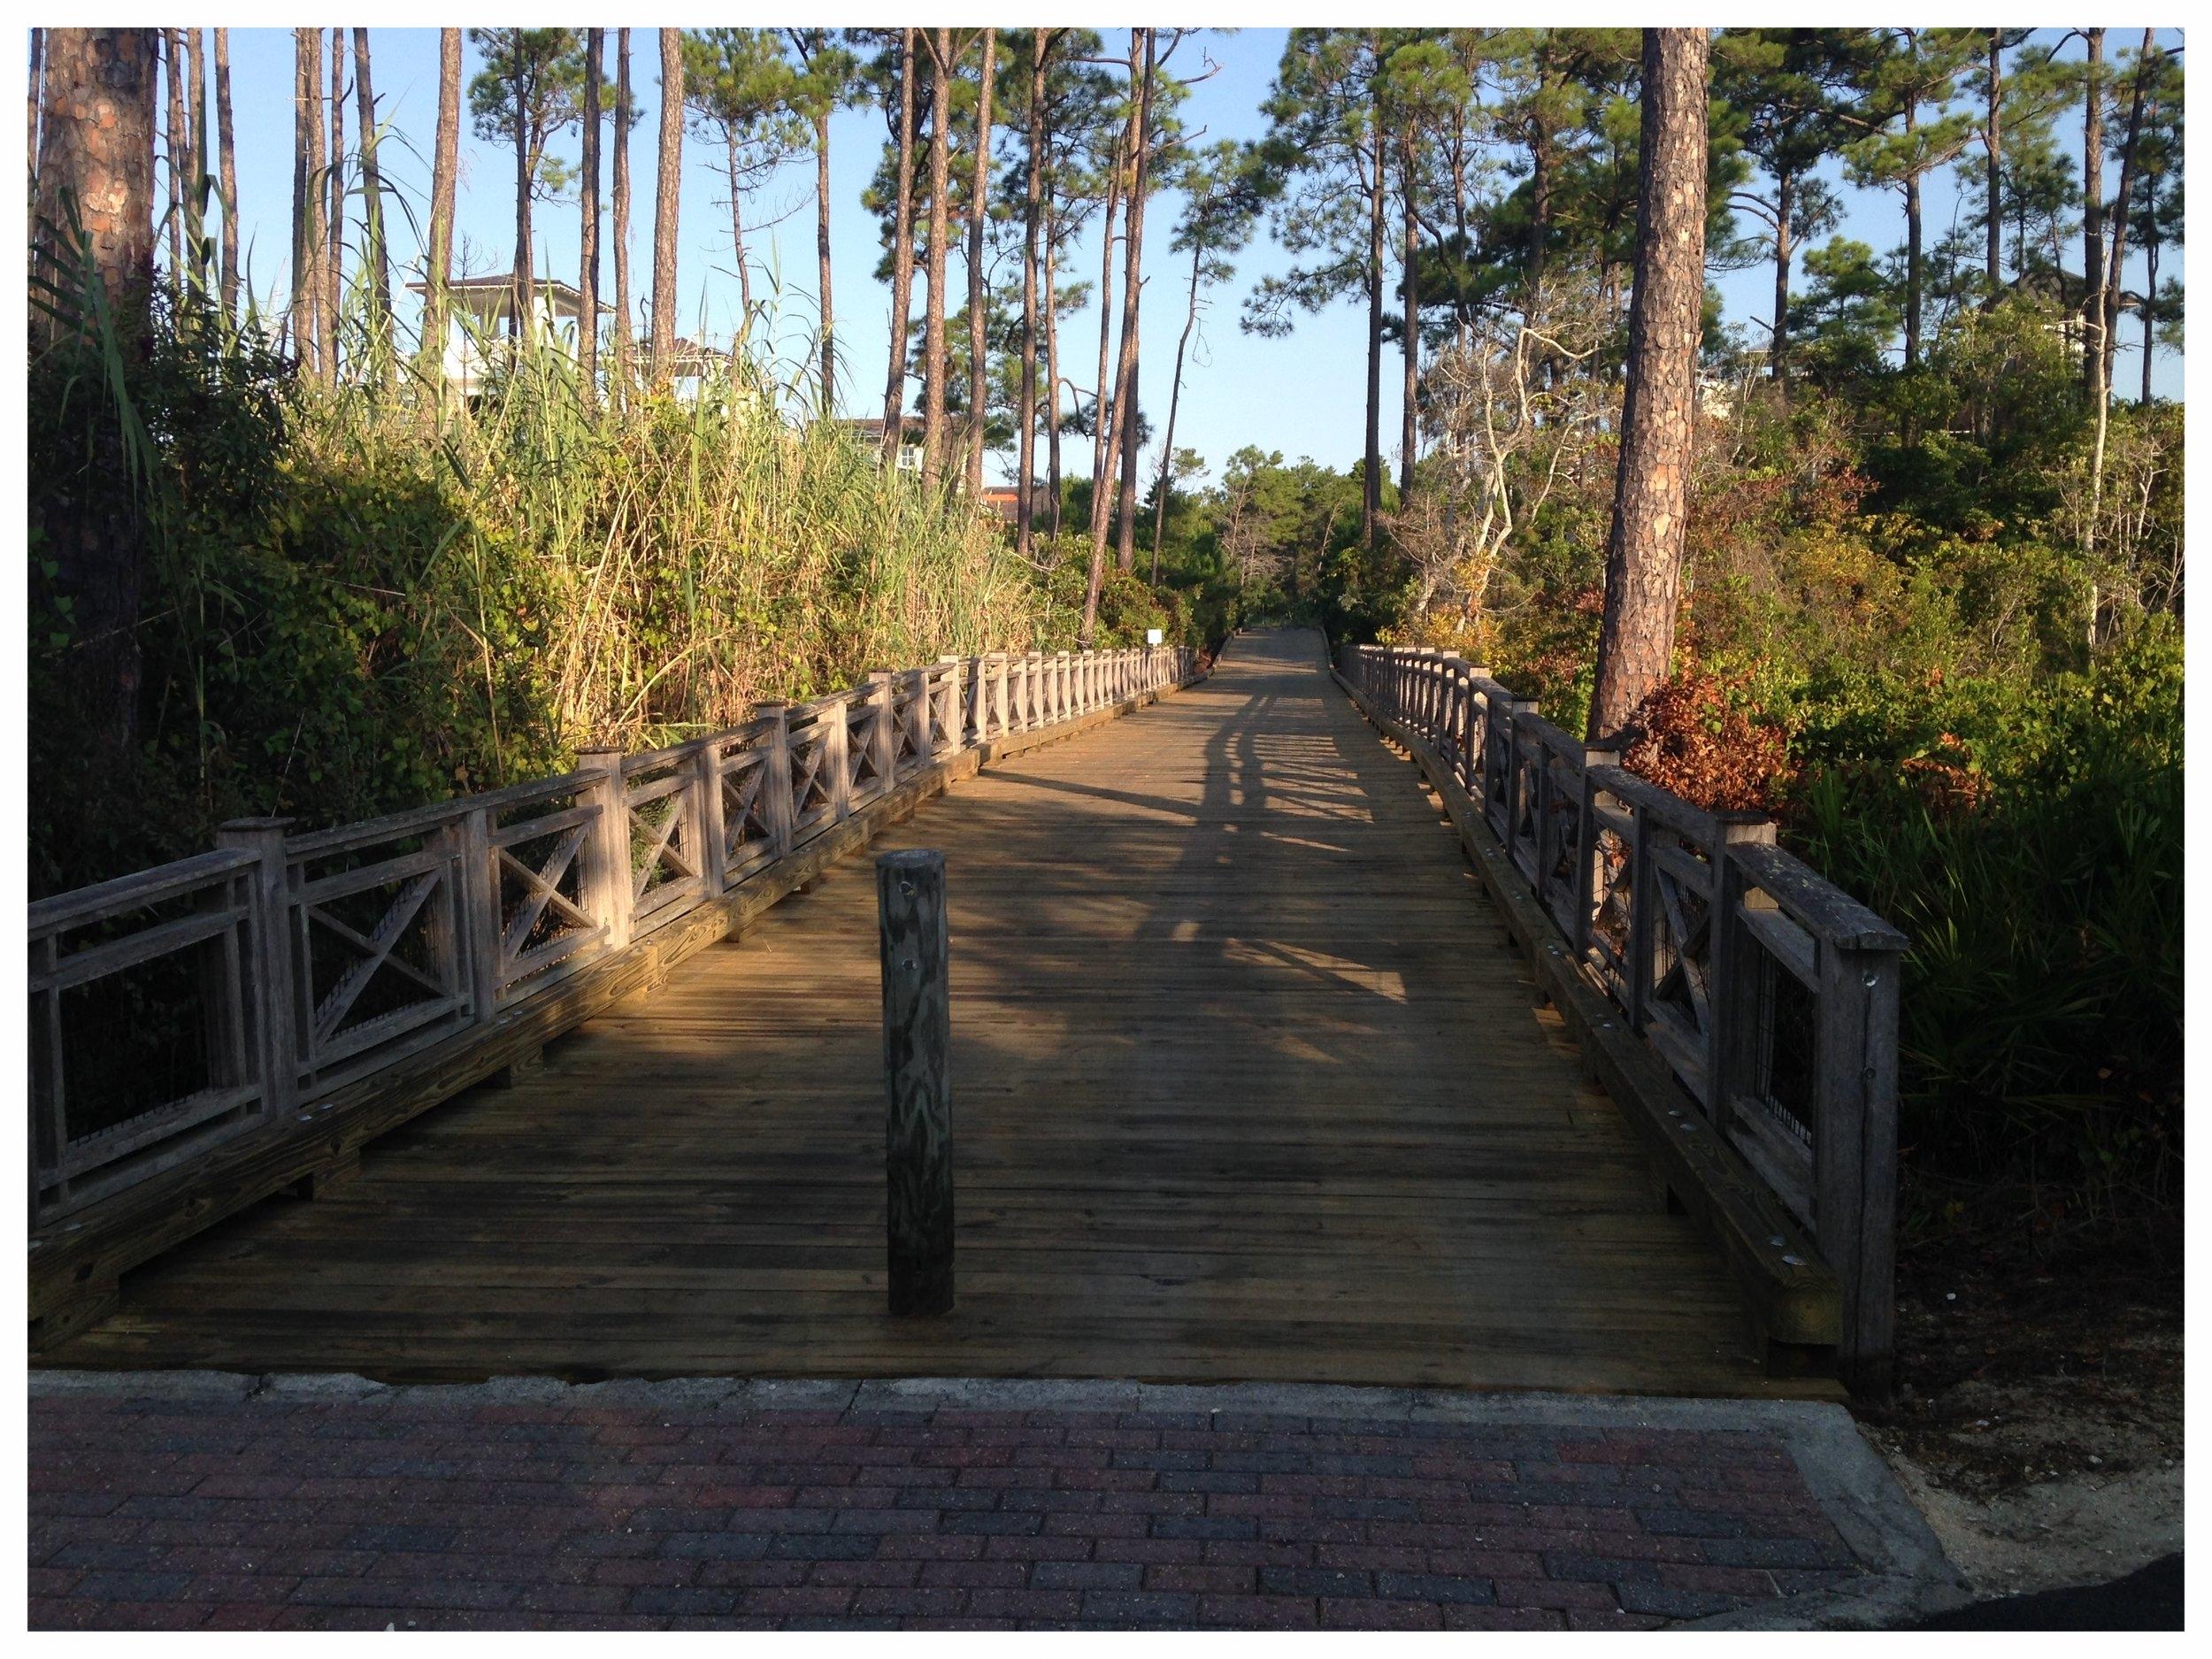 Nature Trail Boardwalk